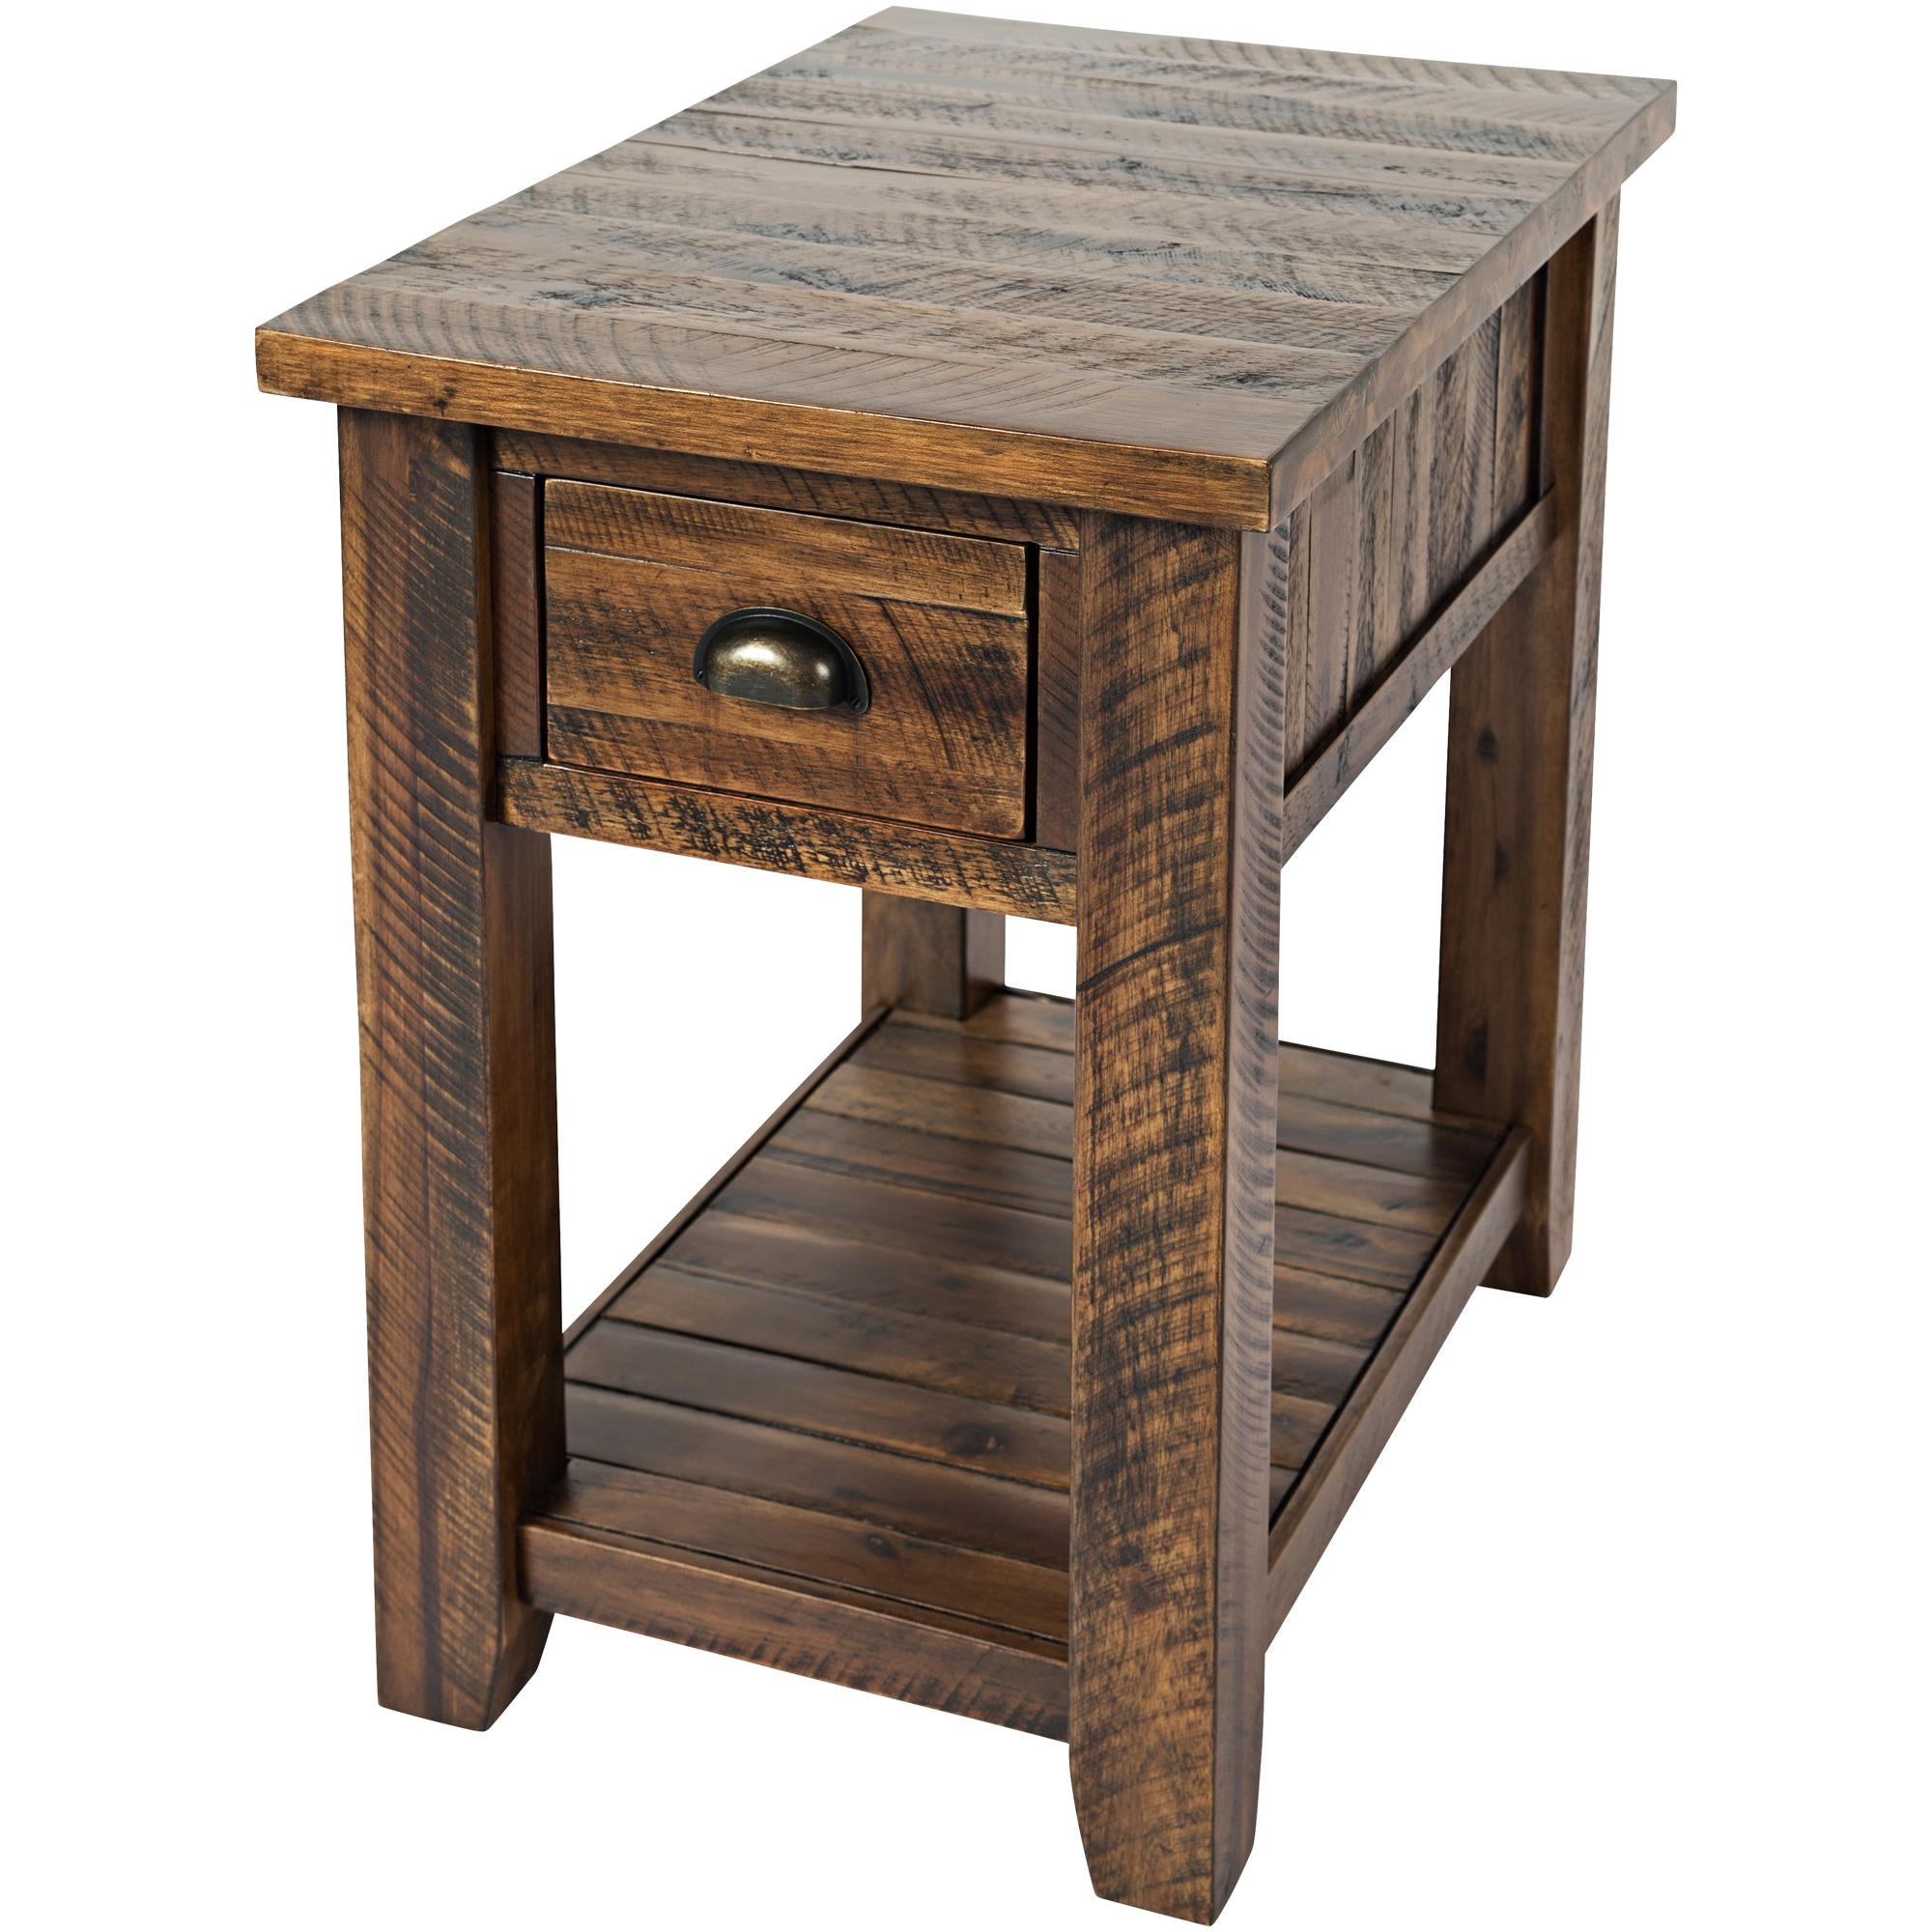 Jofran | Artisans Craft Brown Chairside Table